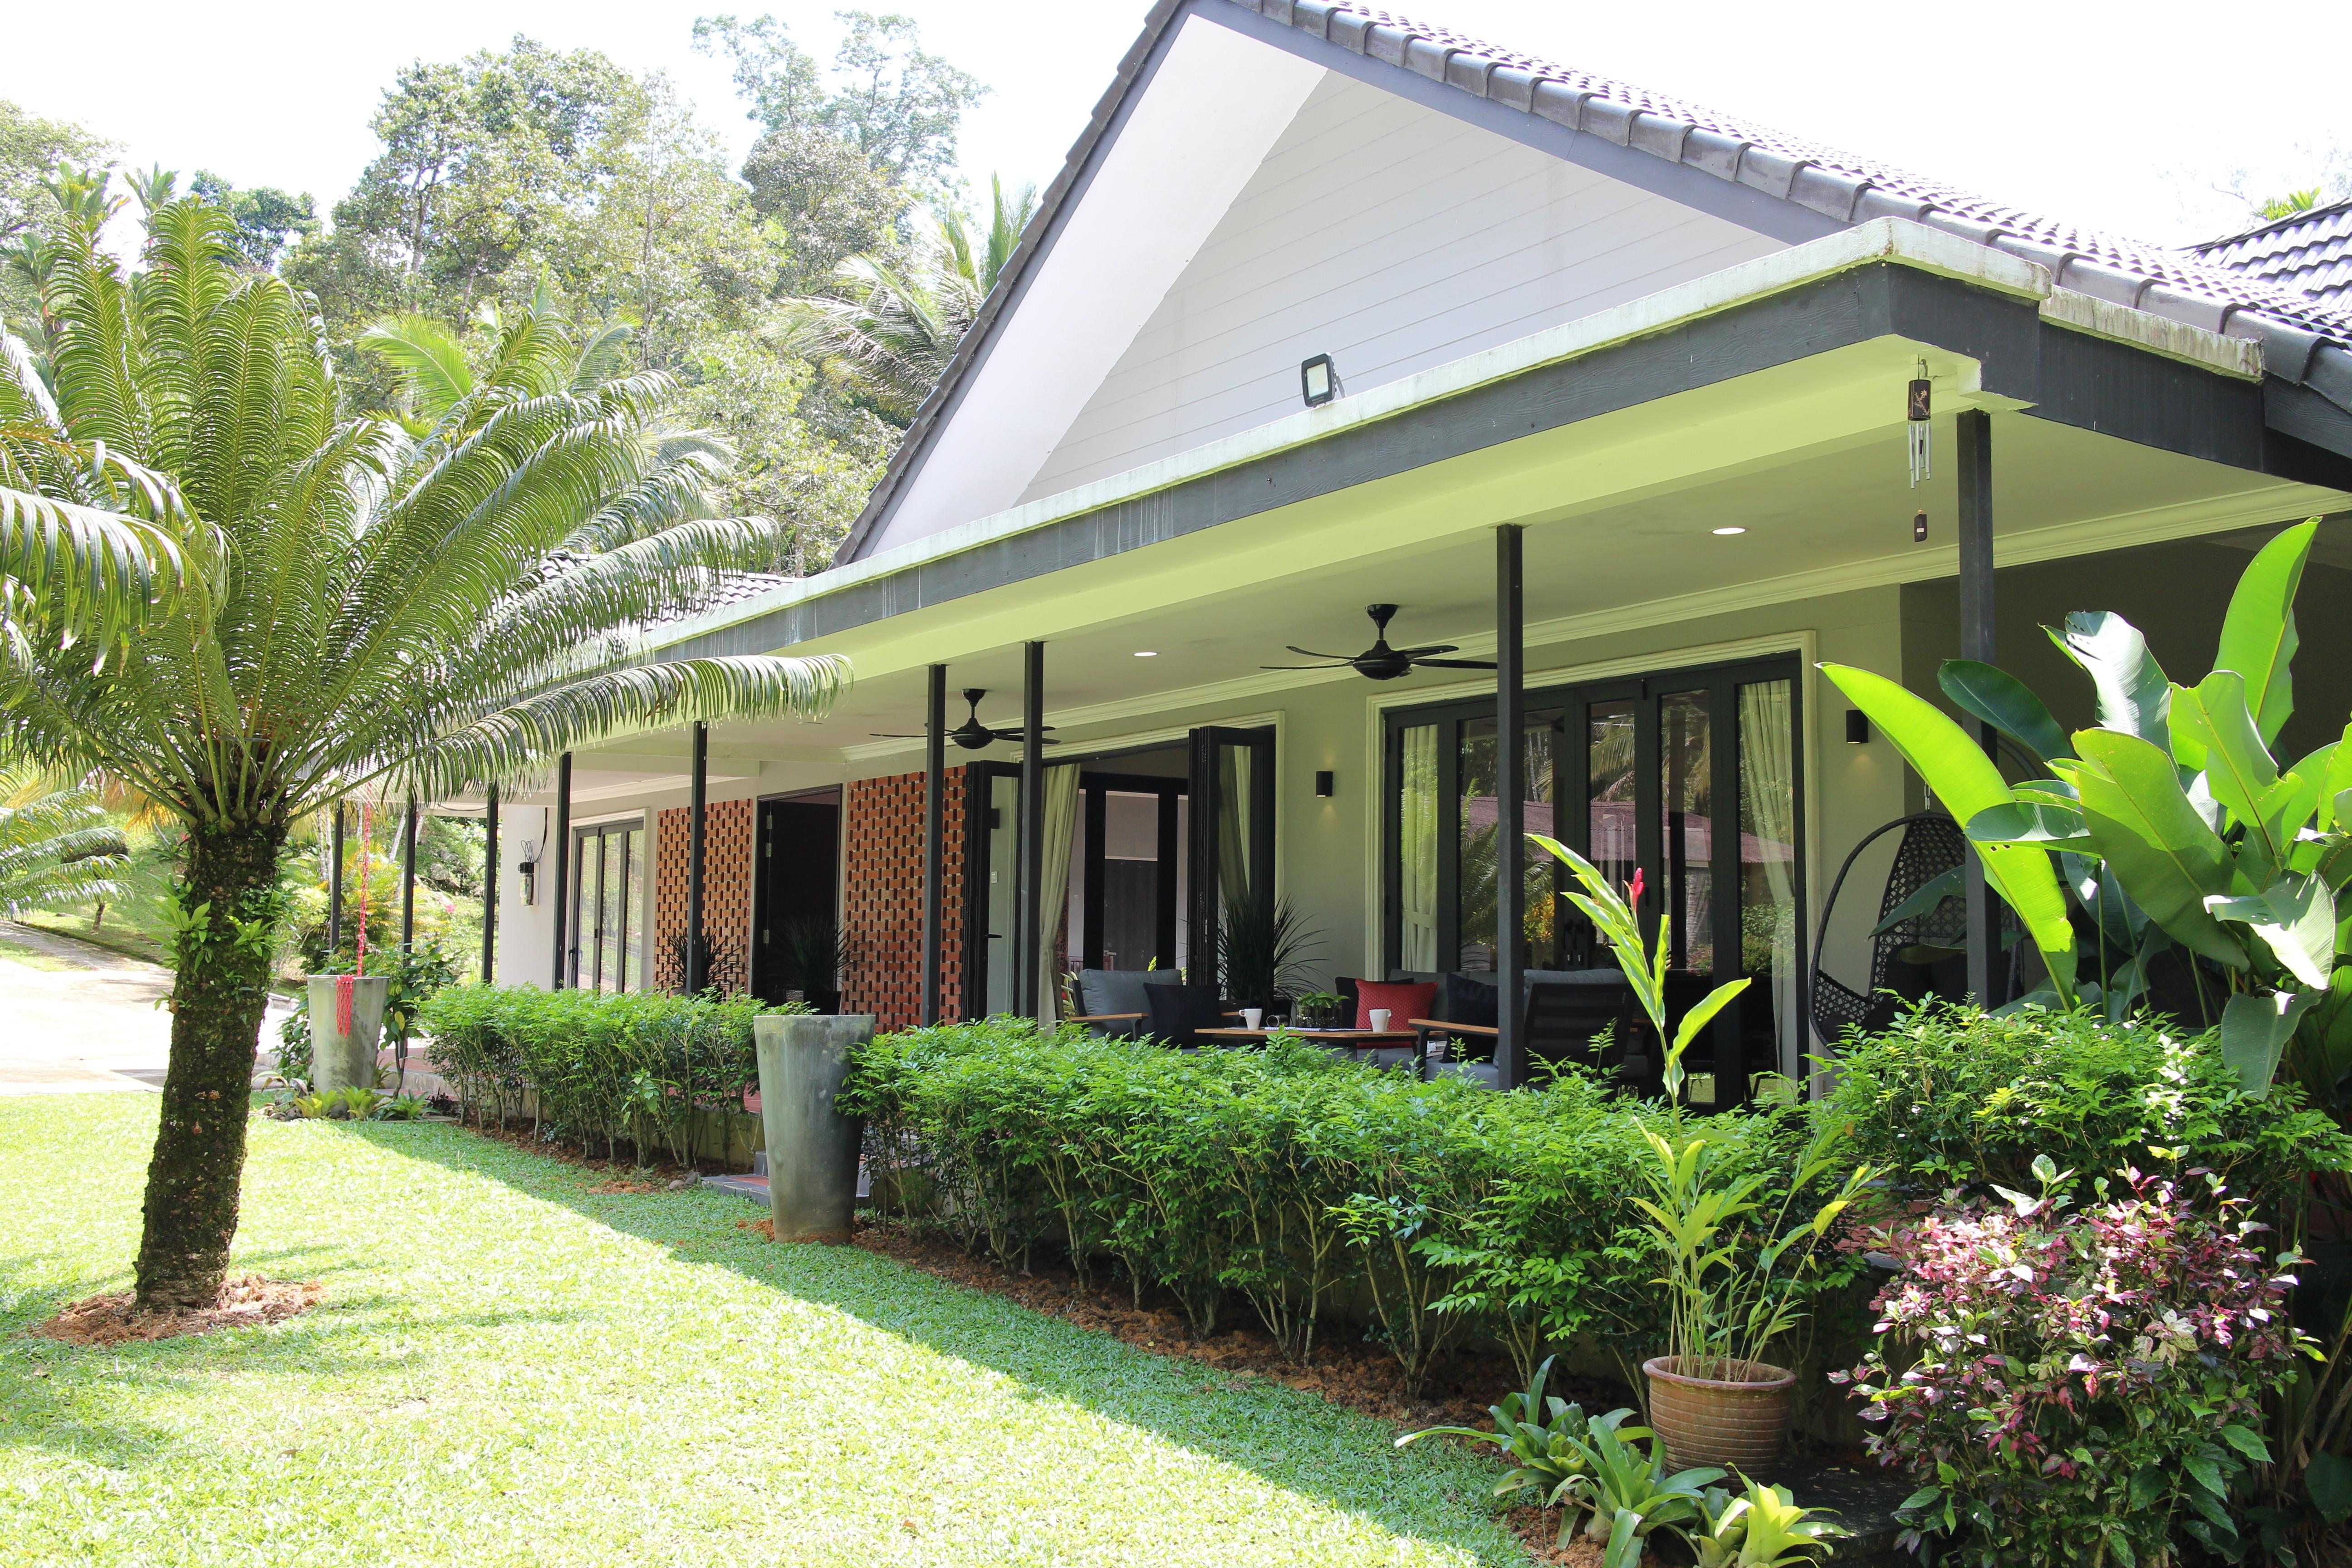 Kenanga Villa Modern Living In Kampung Villas For Rent In Bentong Pahang Malaysia